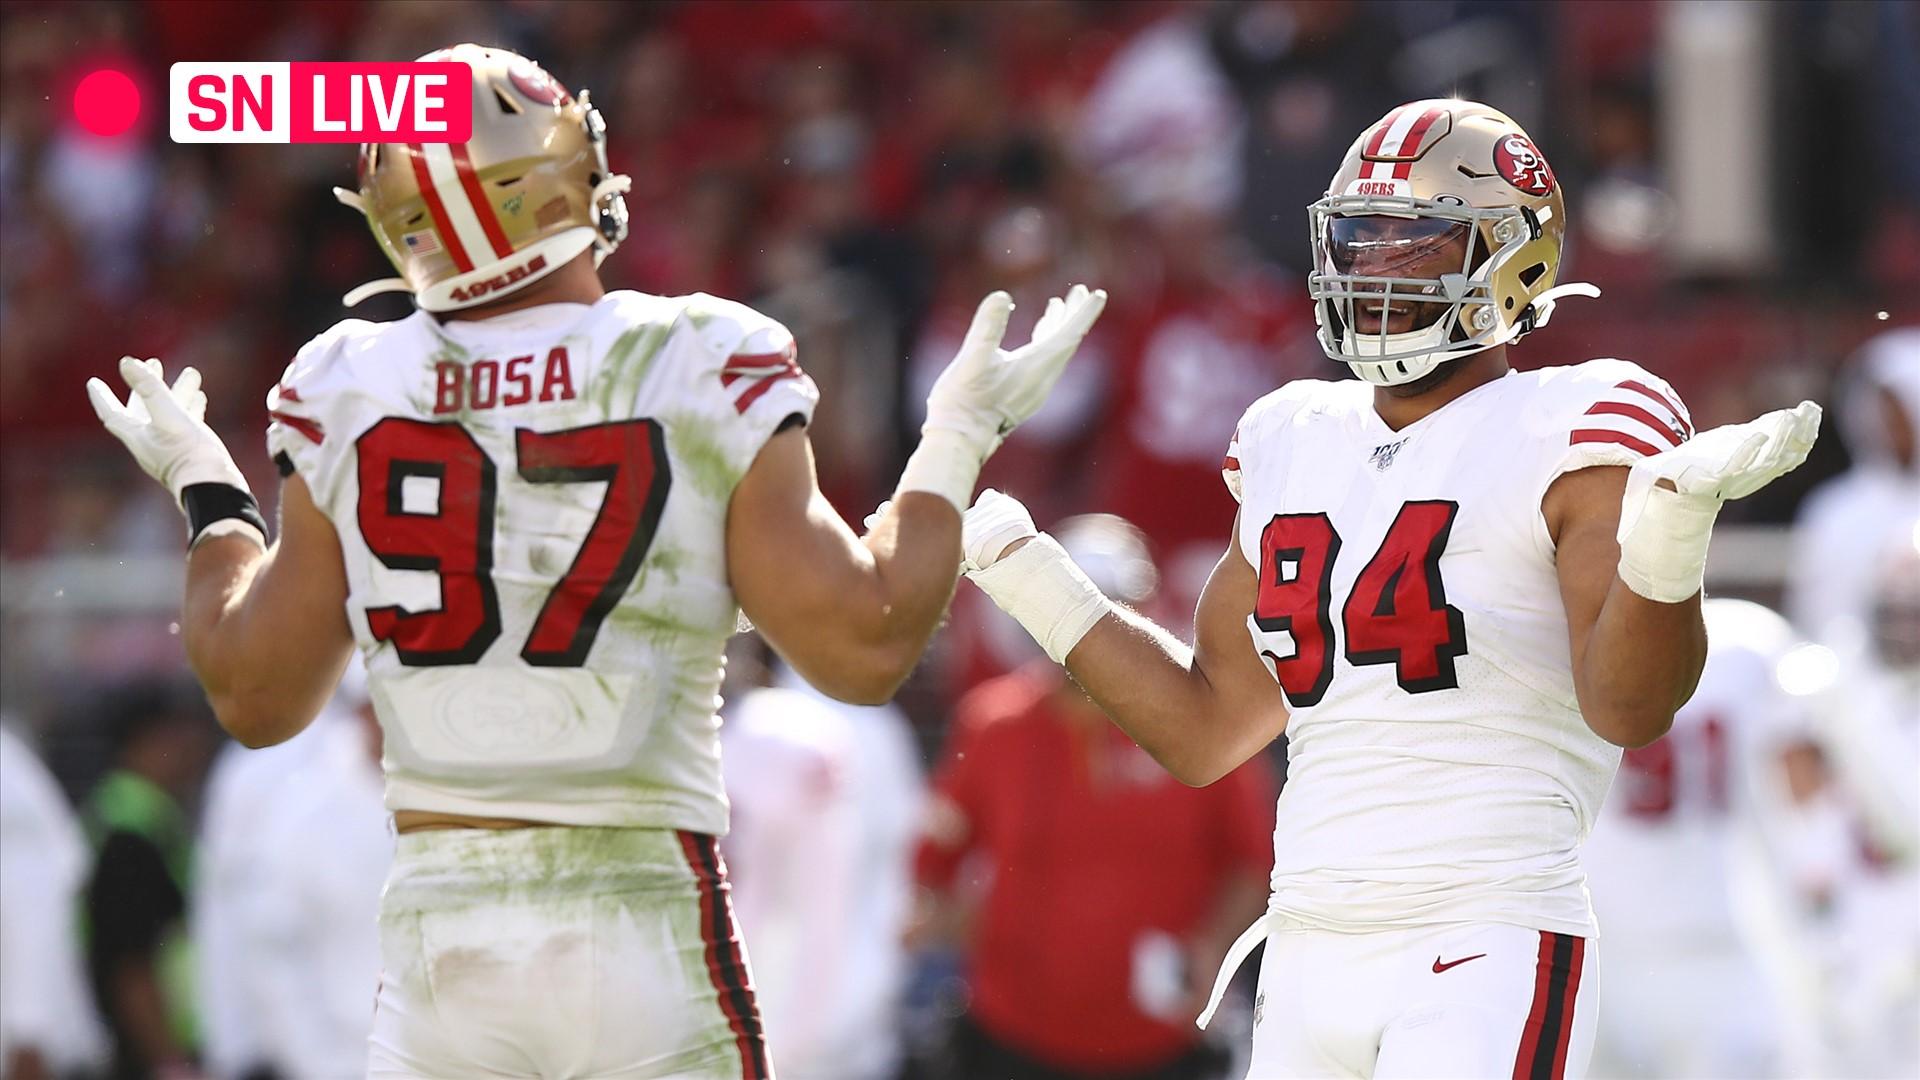 49ers vs. Cardinals: Live score, updates, highlights from 'Thursday Night Football'